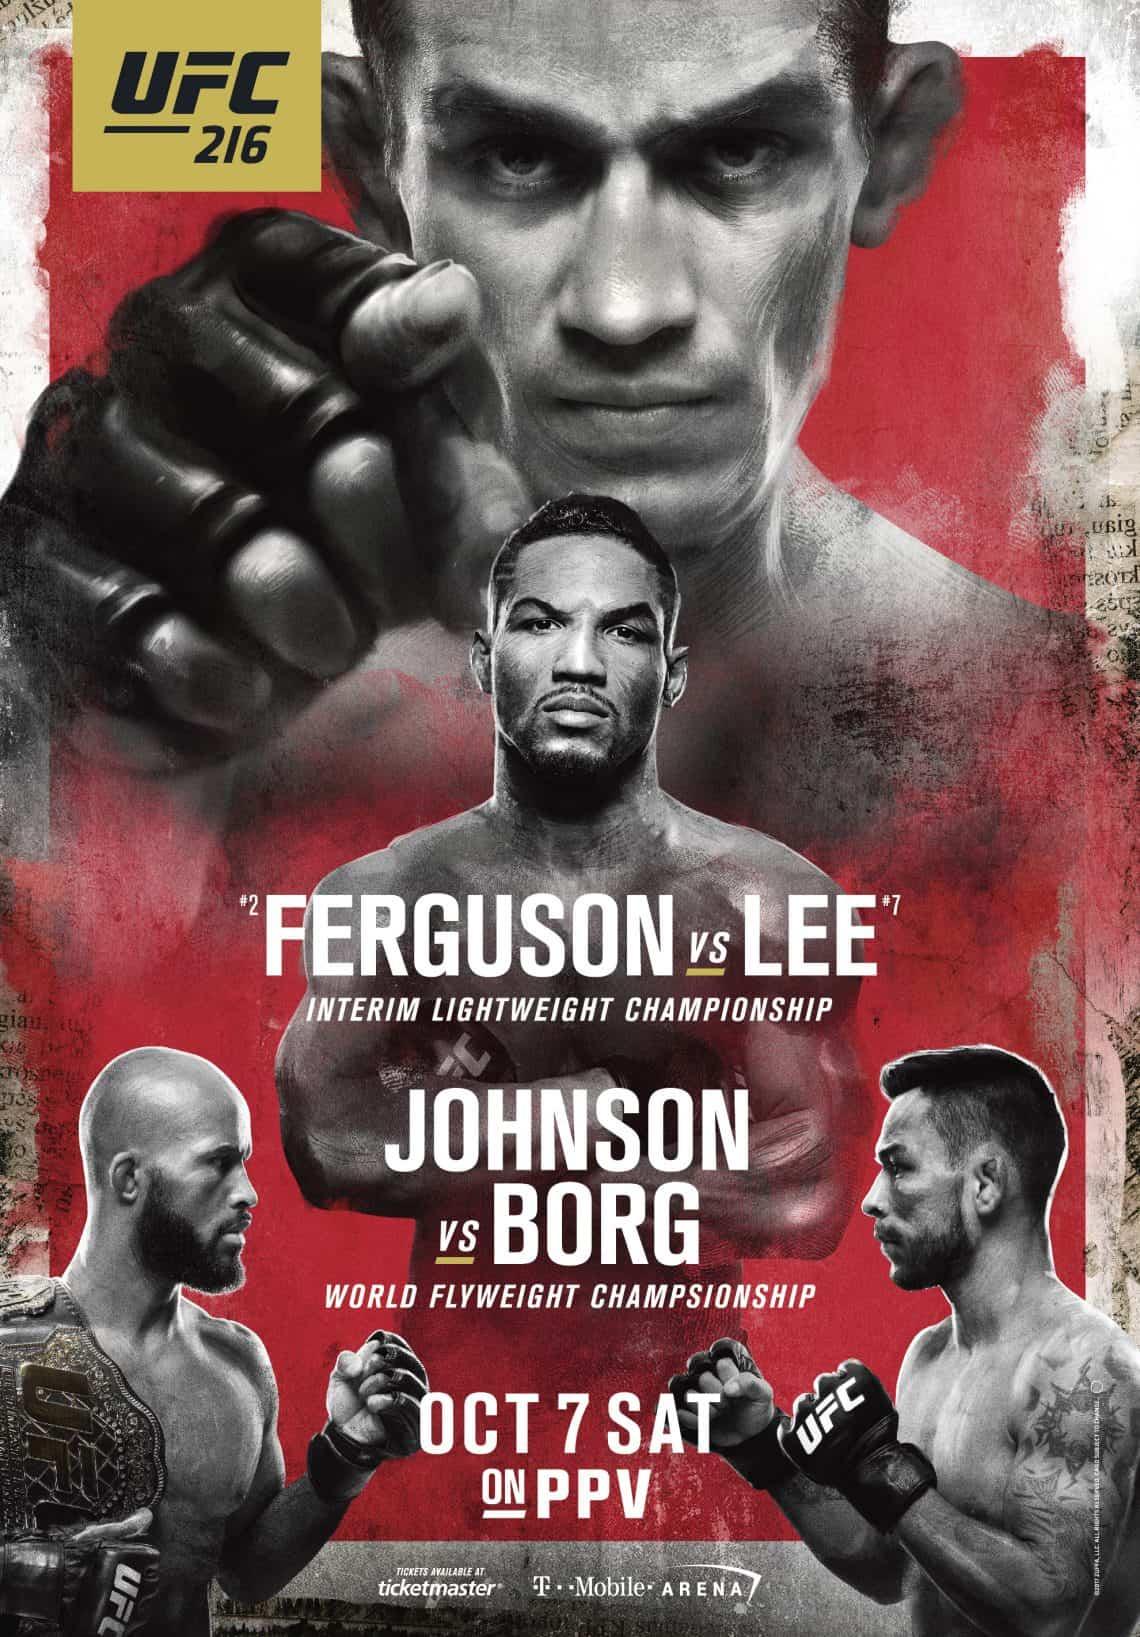 UFC 216: Ferguson vs. Lee 1